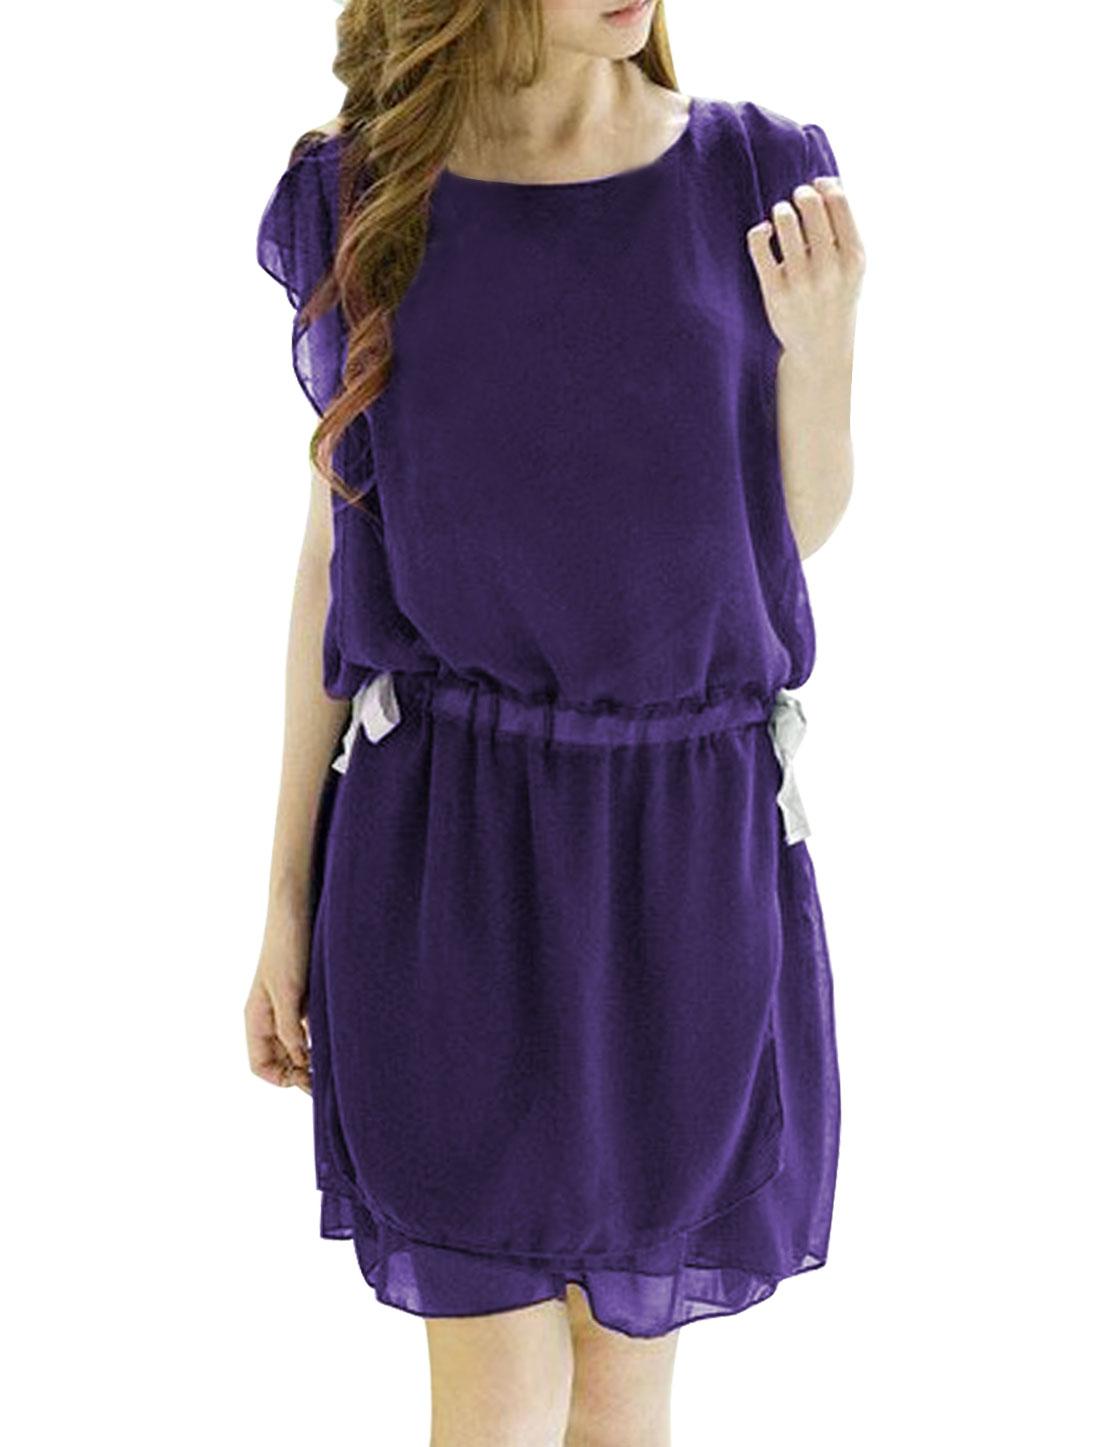 Lady Purple Round Neck Pullover Self Tie String Tiered Summer Dress L